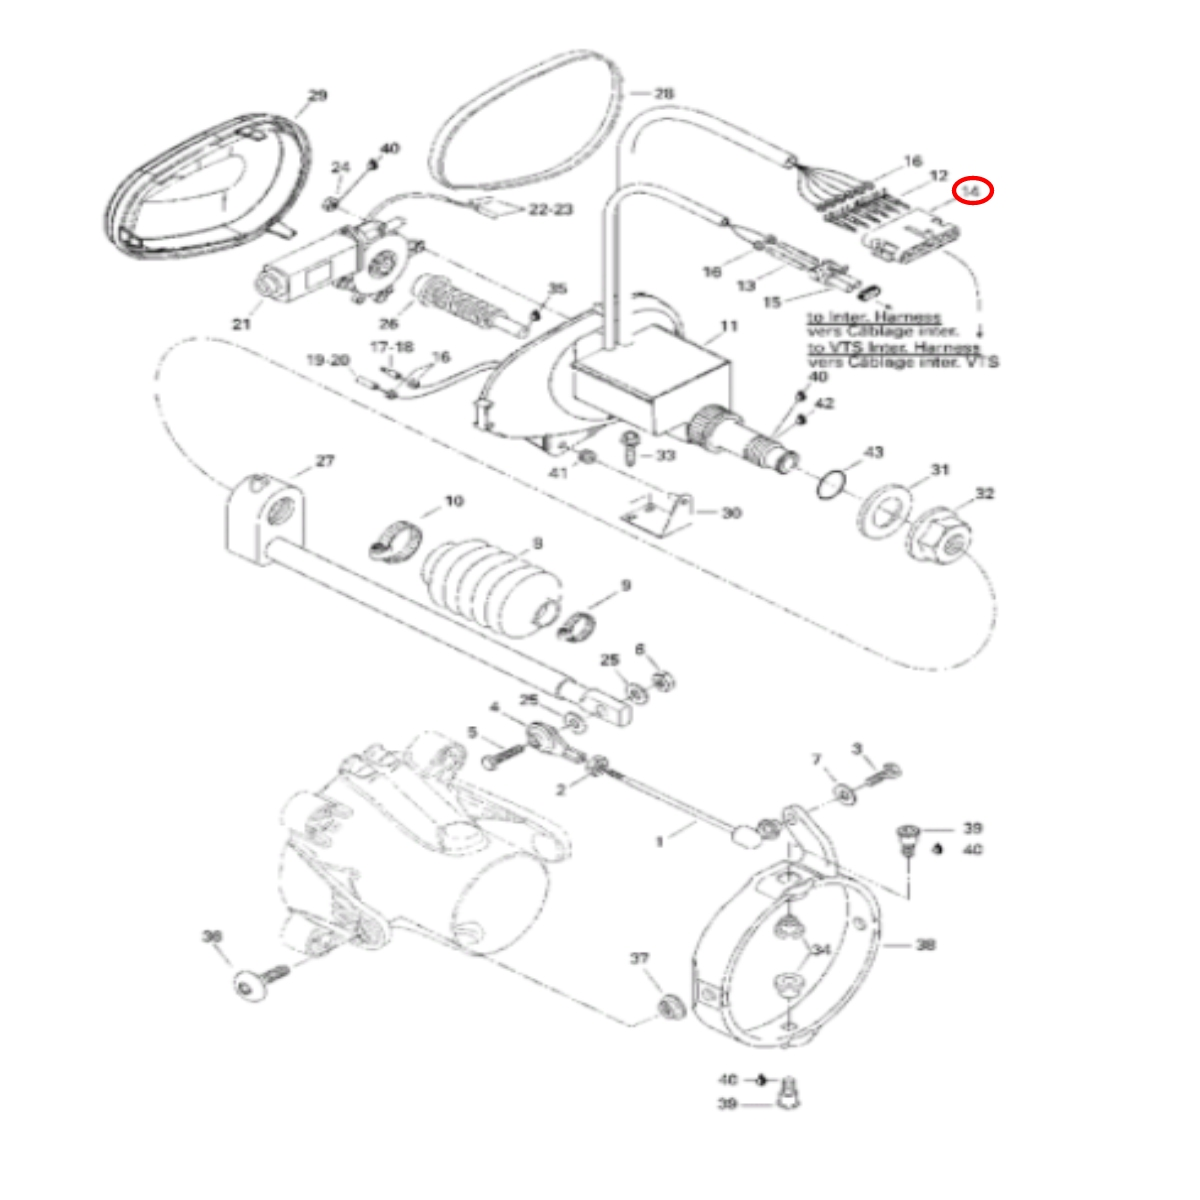 Conector Elétrico 6 fios para Jet Ski Sea Doo GTX,GTI,GSX,XP  - Radical Peças - Peças para Jet Ski